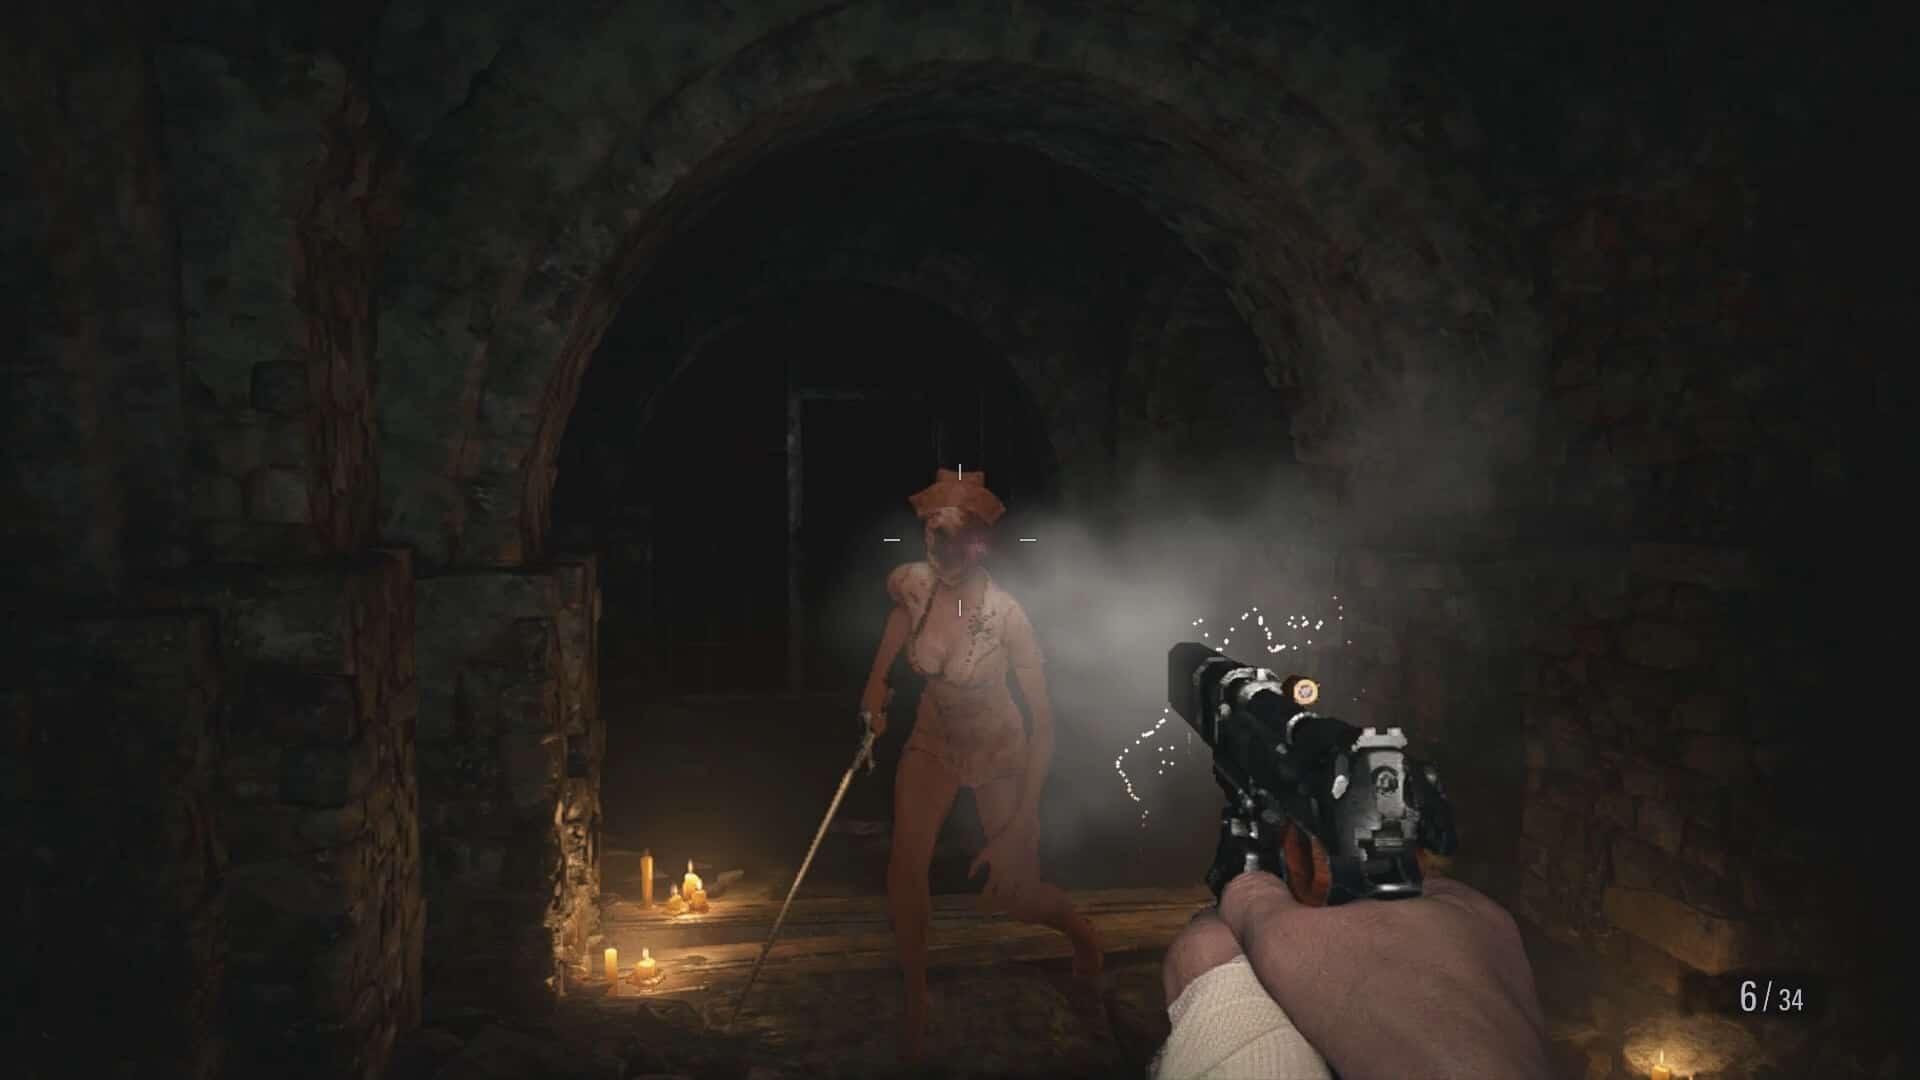 Silent-Hill-Nurses-Mod-for-Resident-Evil-Village-1